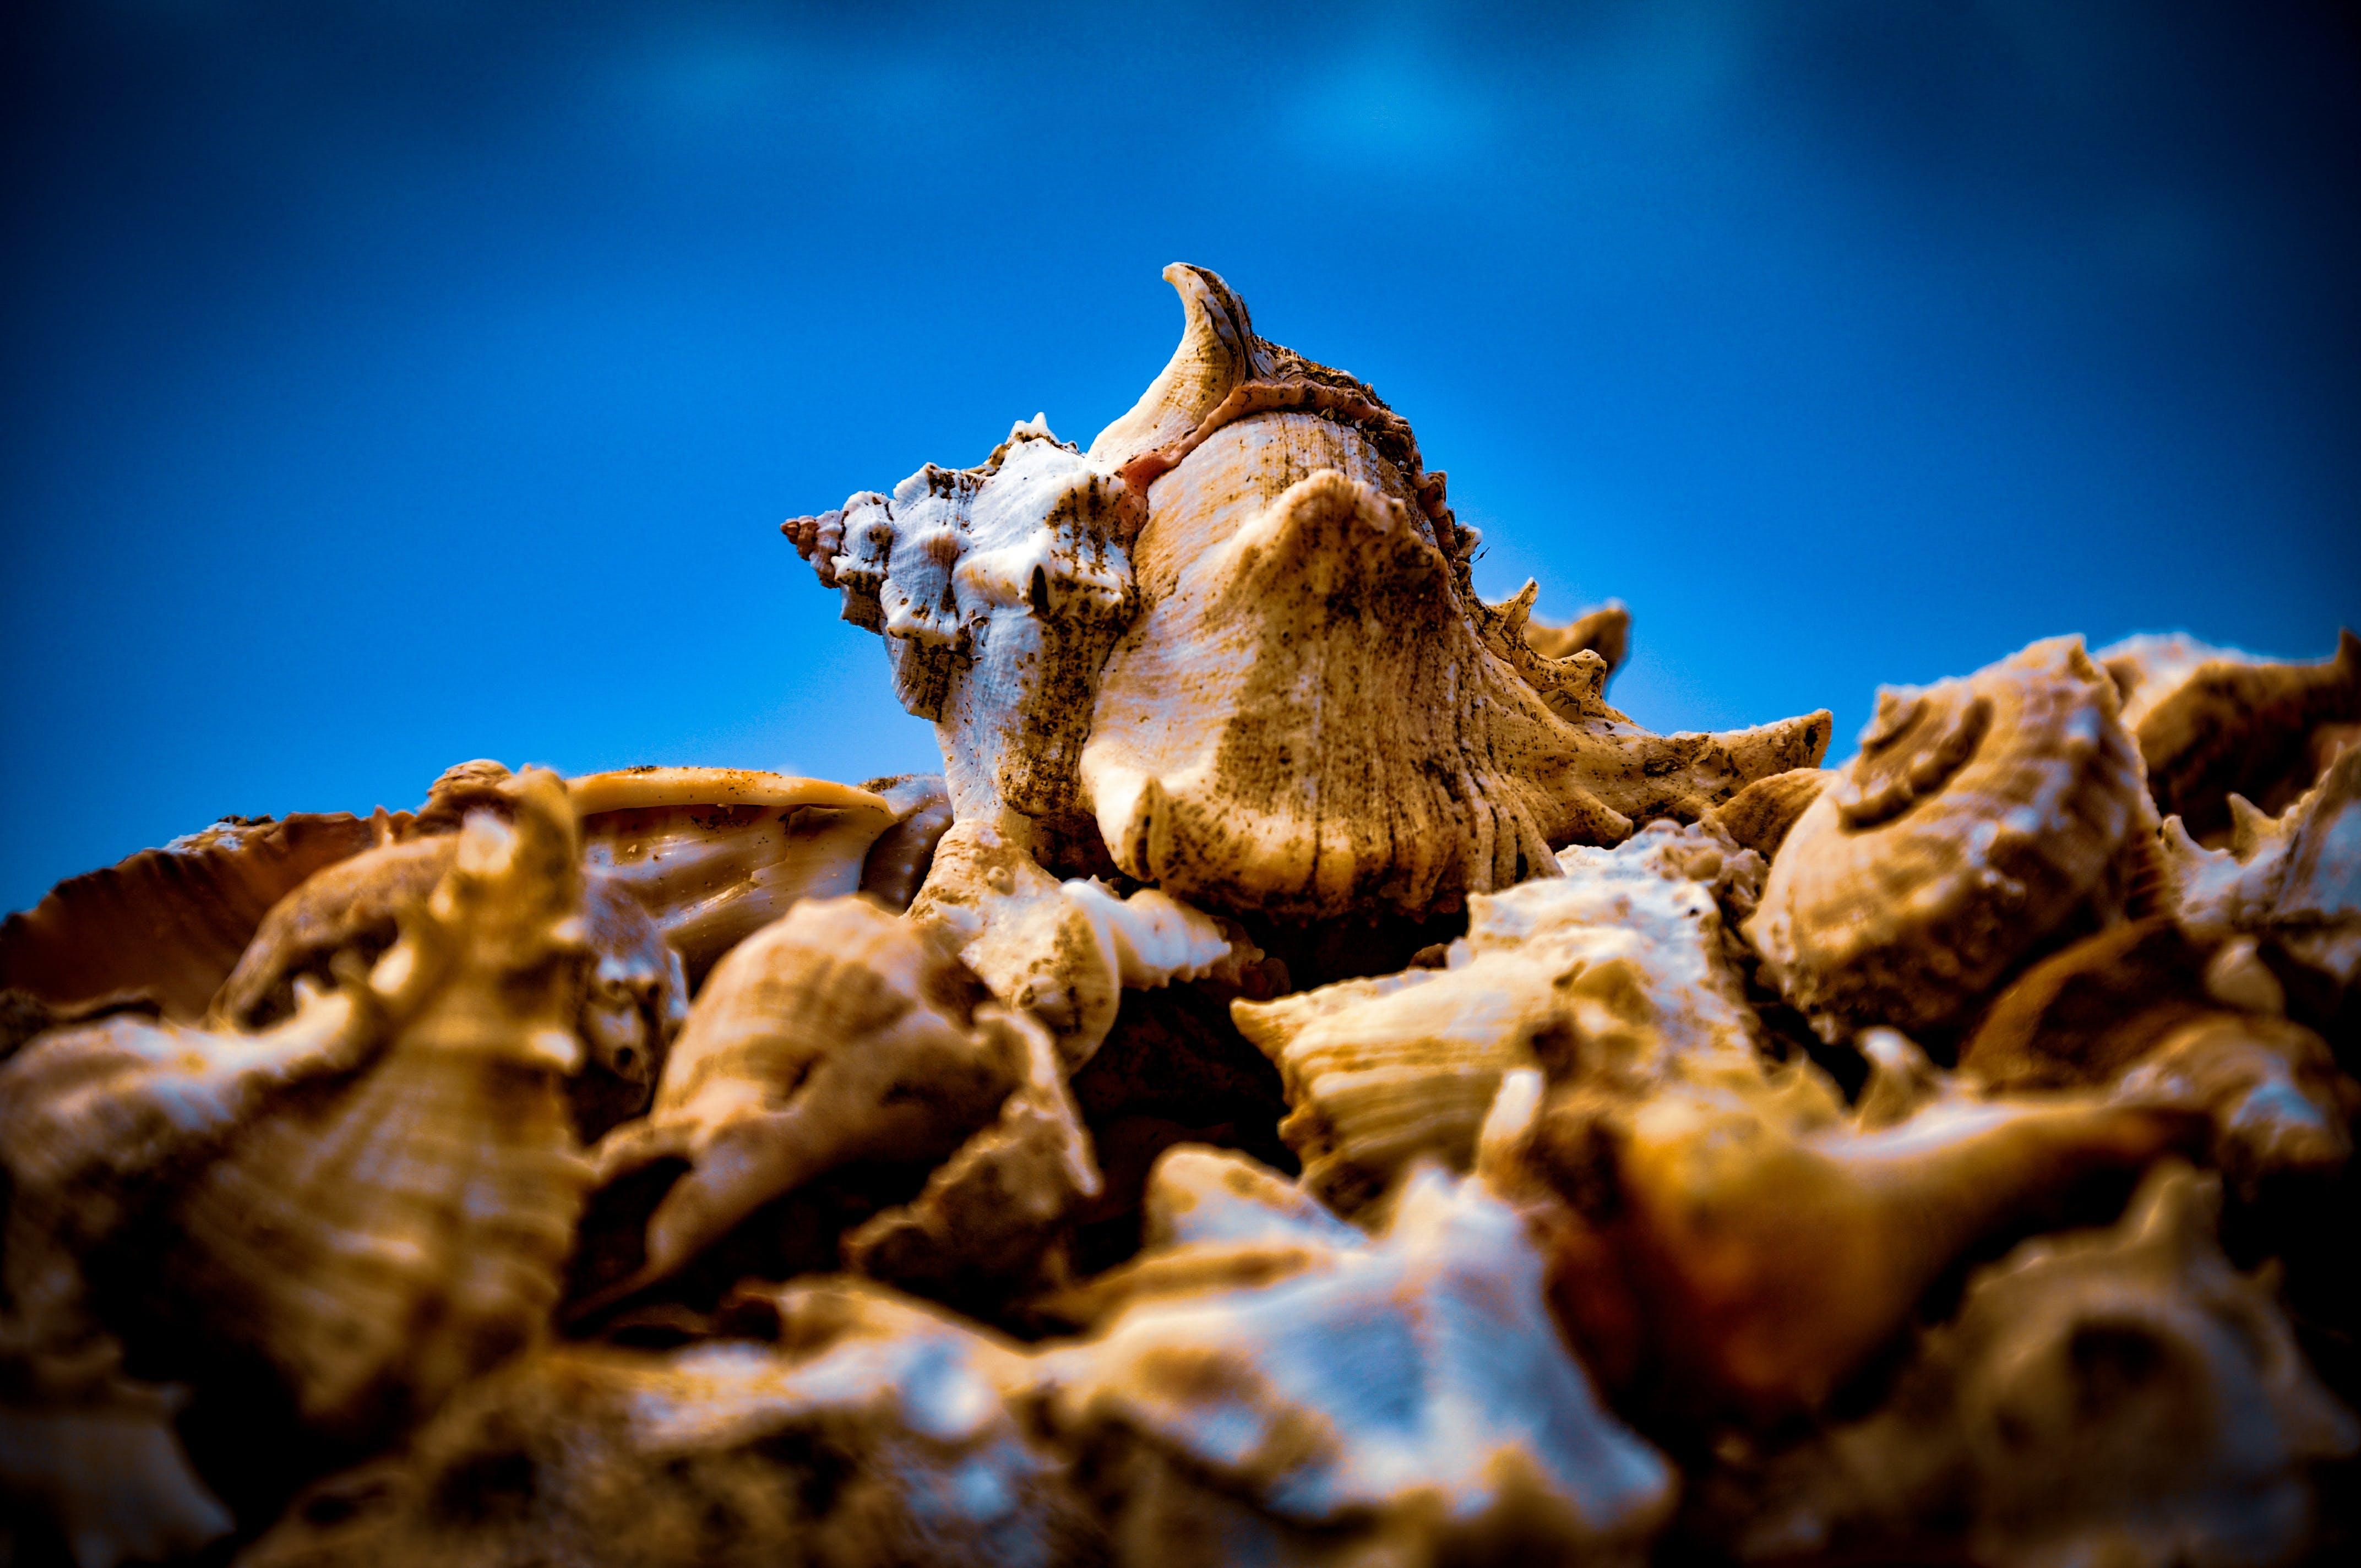 Kostenloses Stock Foto zu braun, makrofotografie, mollusken, muscheln